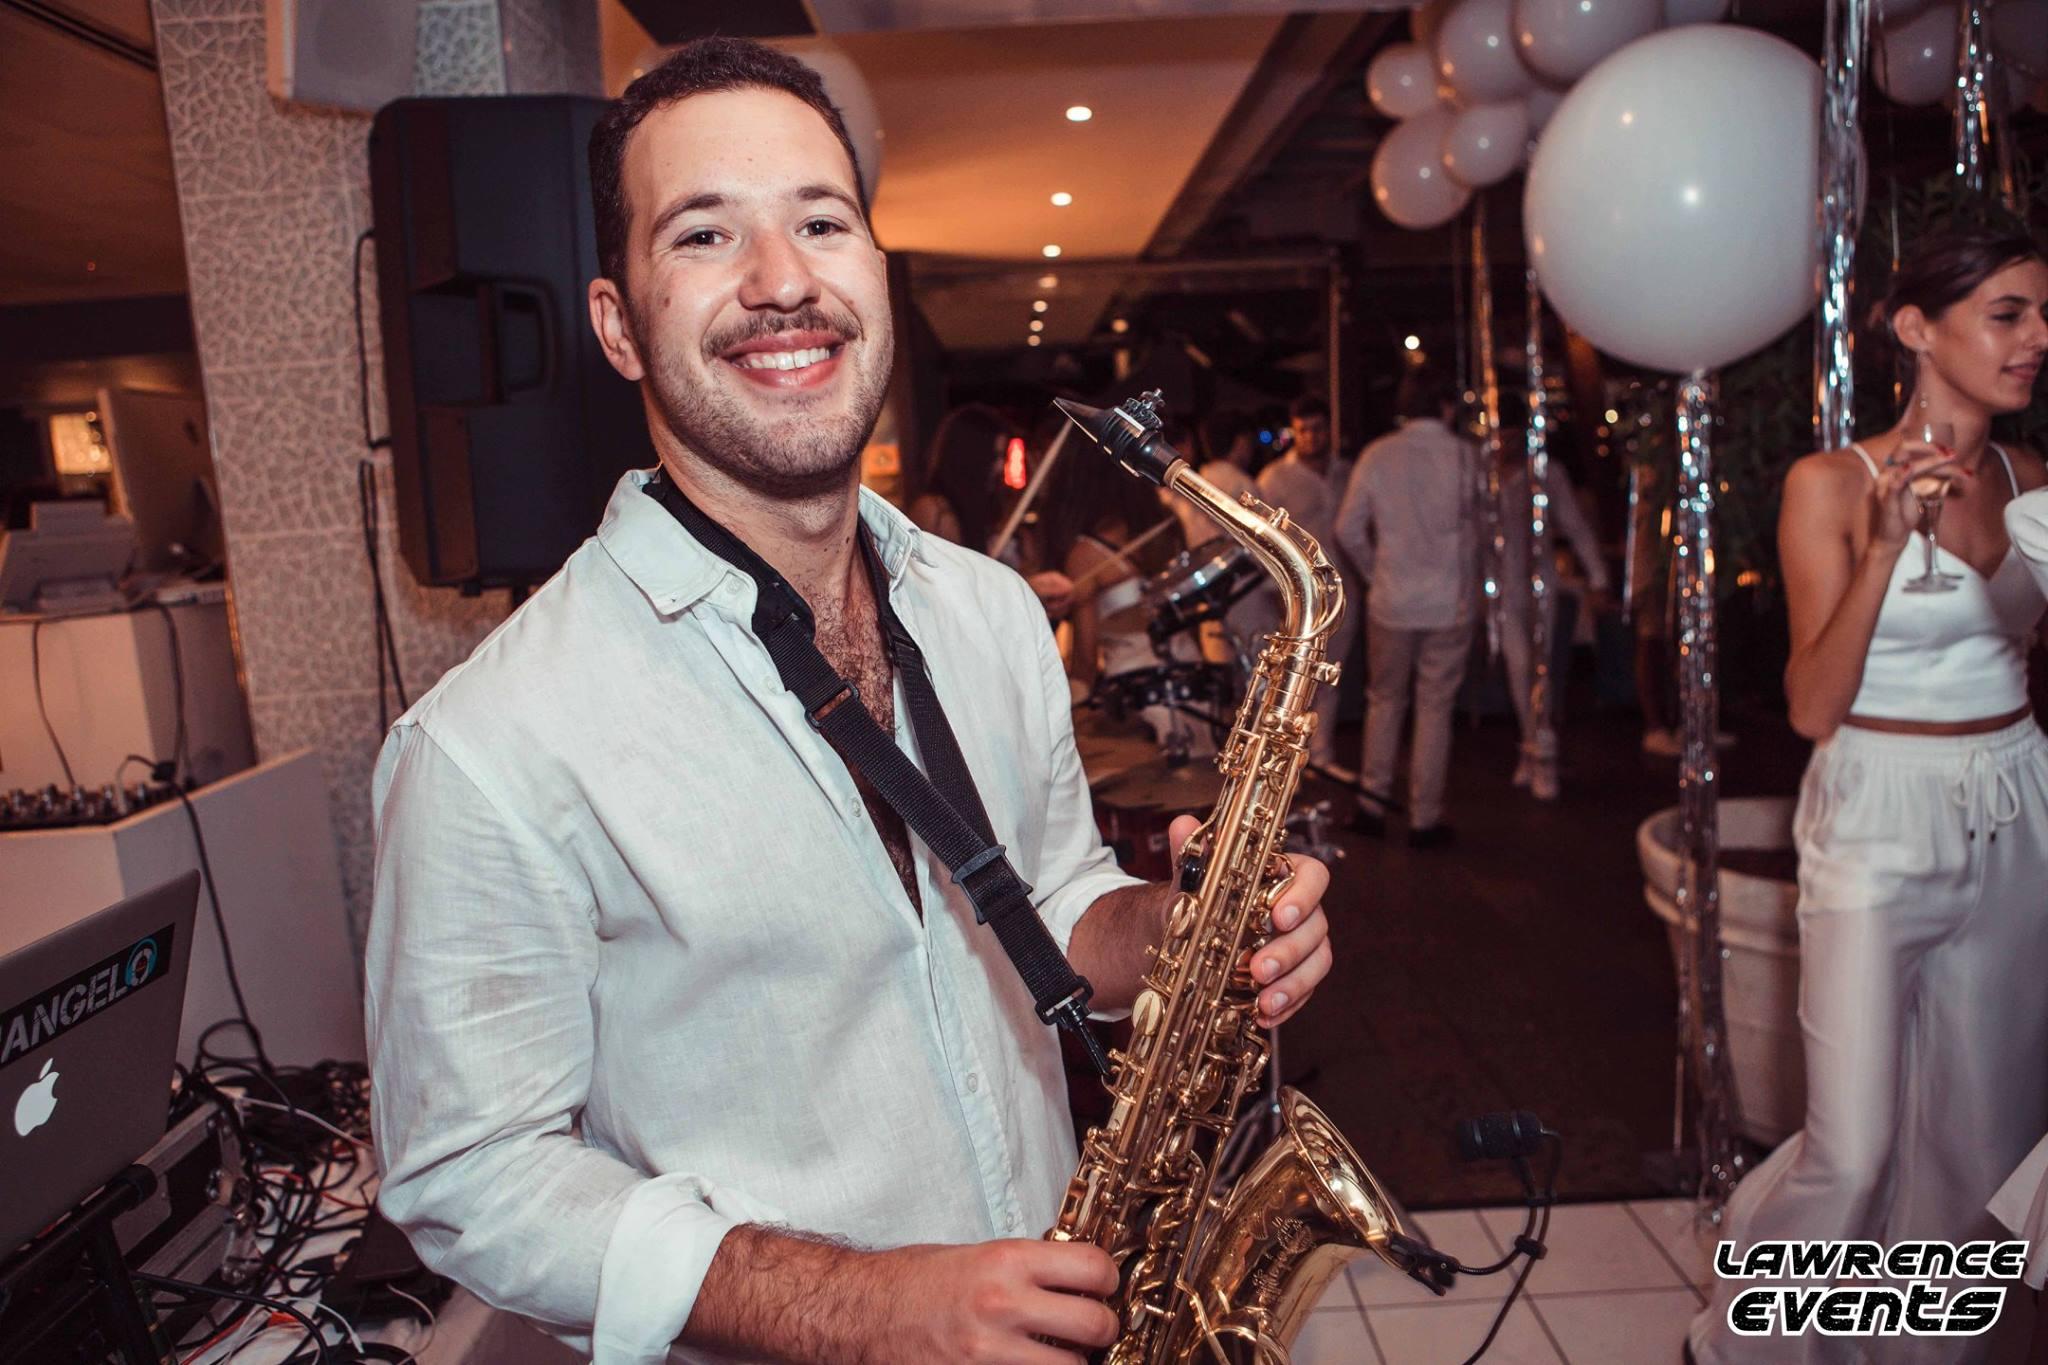 Sax player Sydney